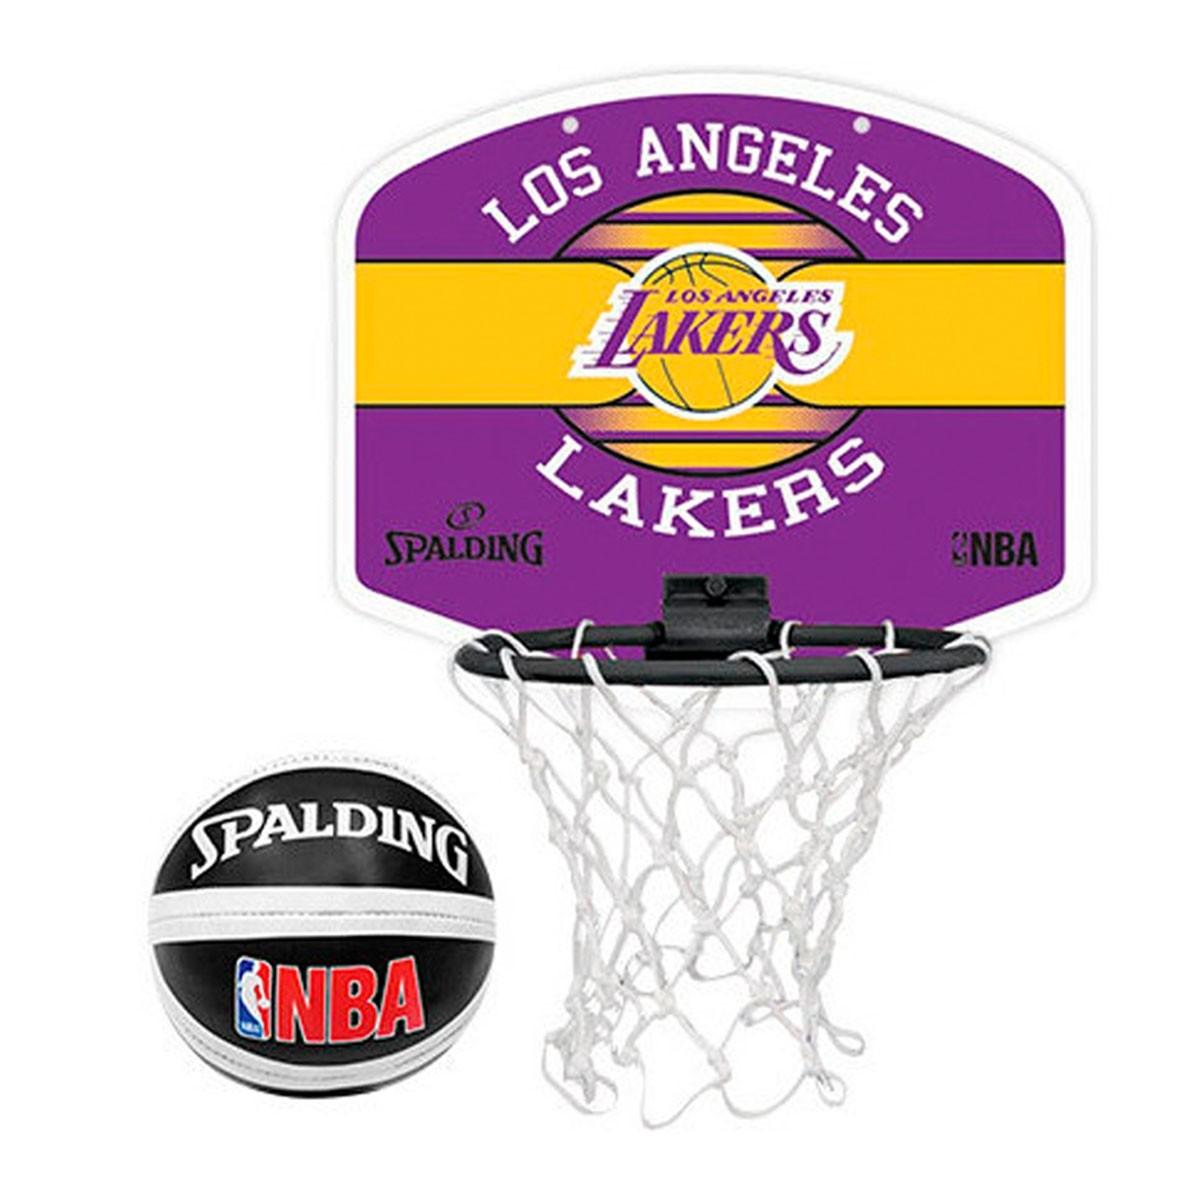 Spalding NBA Miniboards 'Lakers'